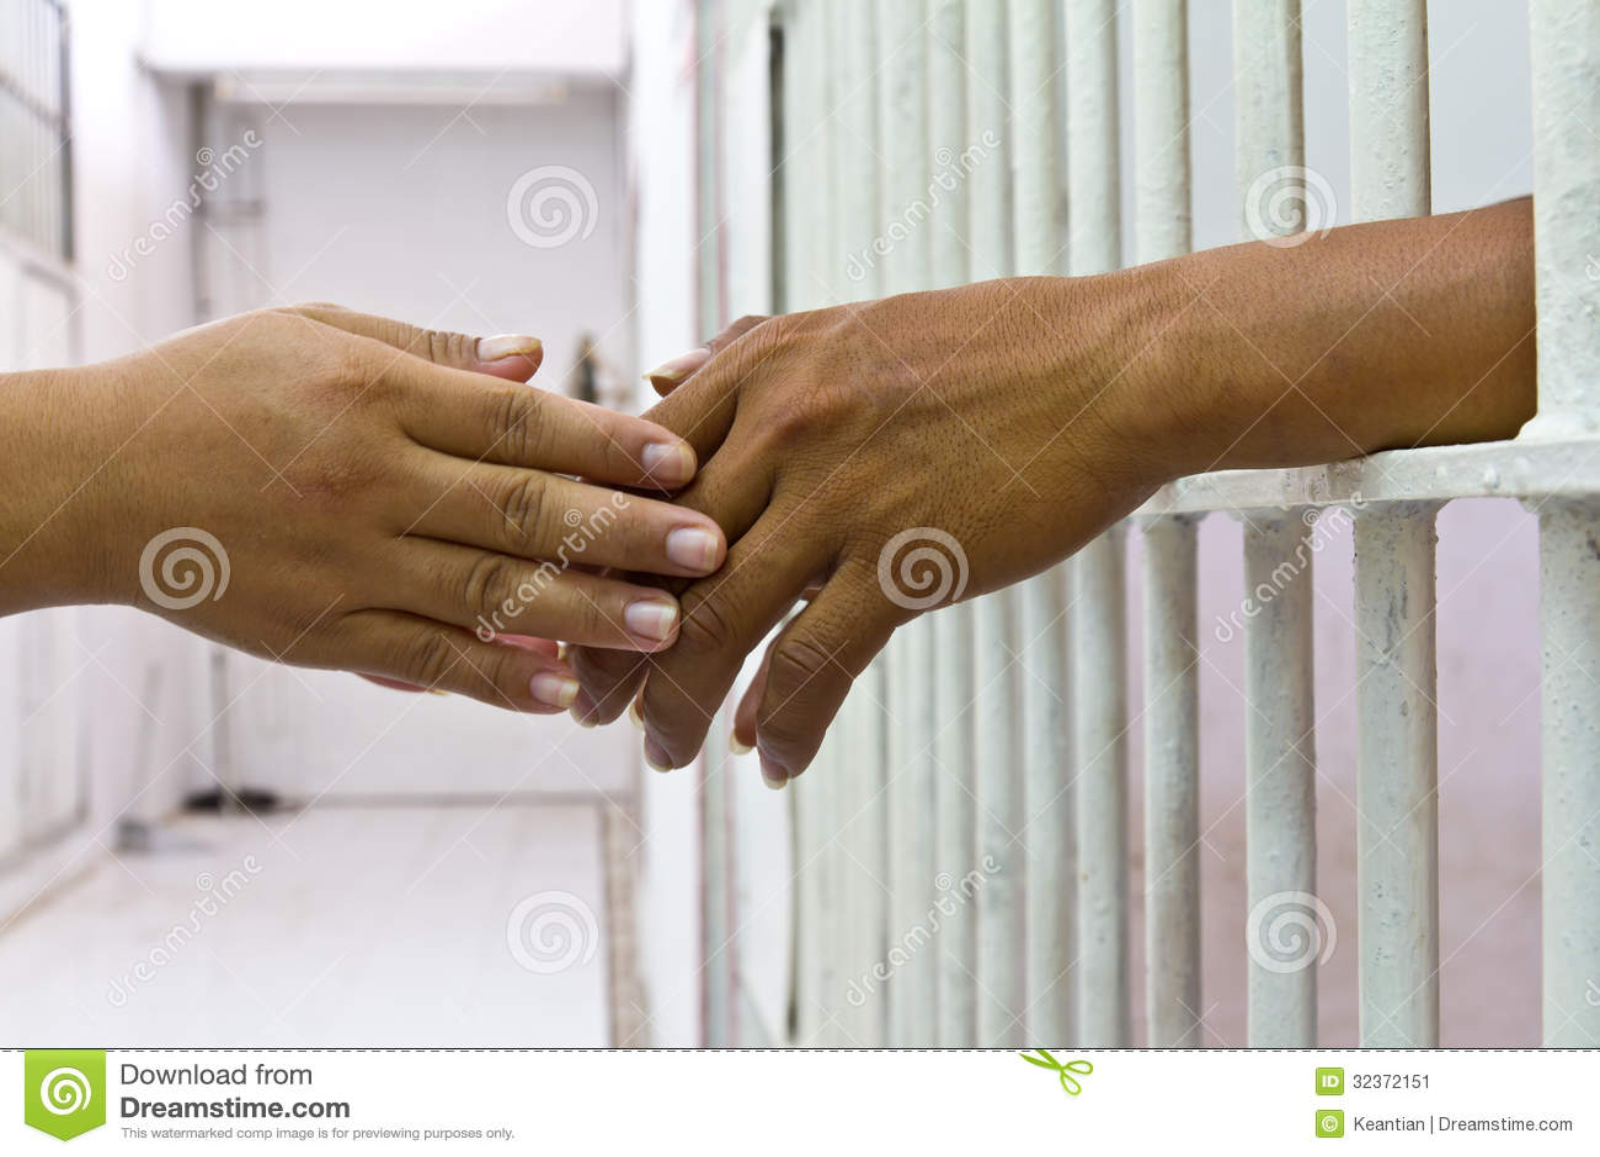 Hand holding hand.